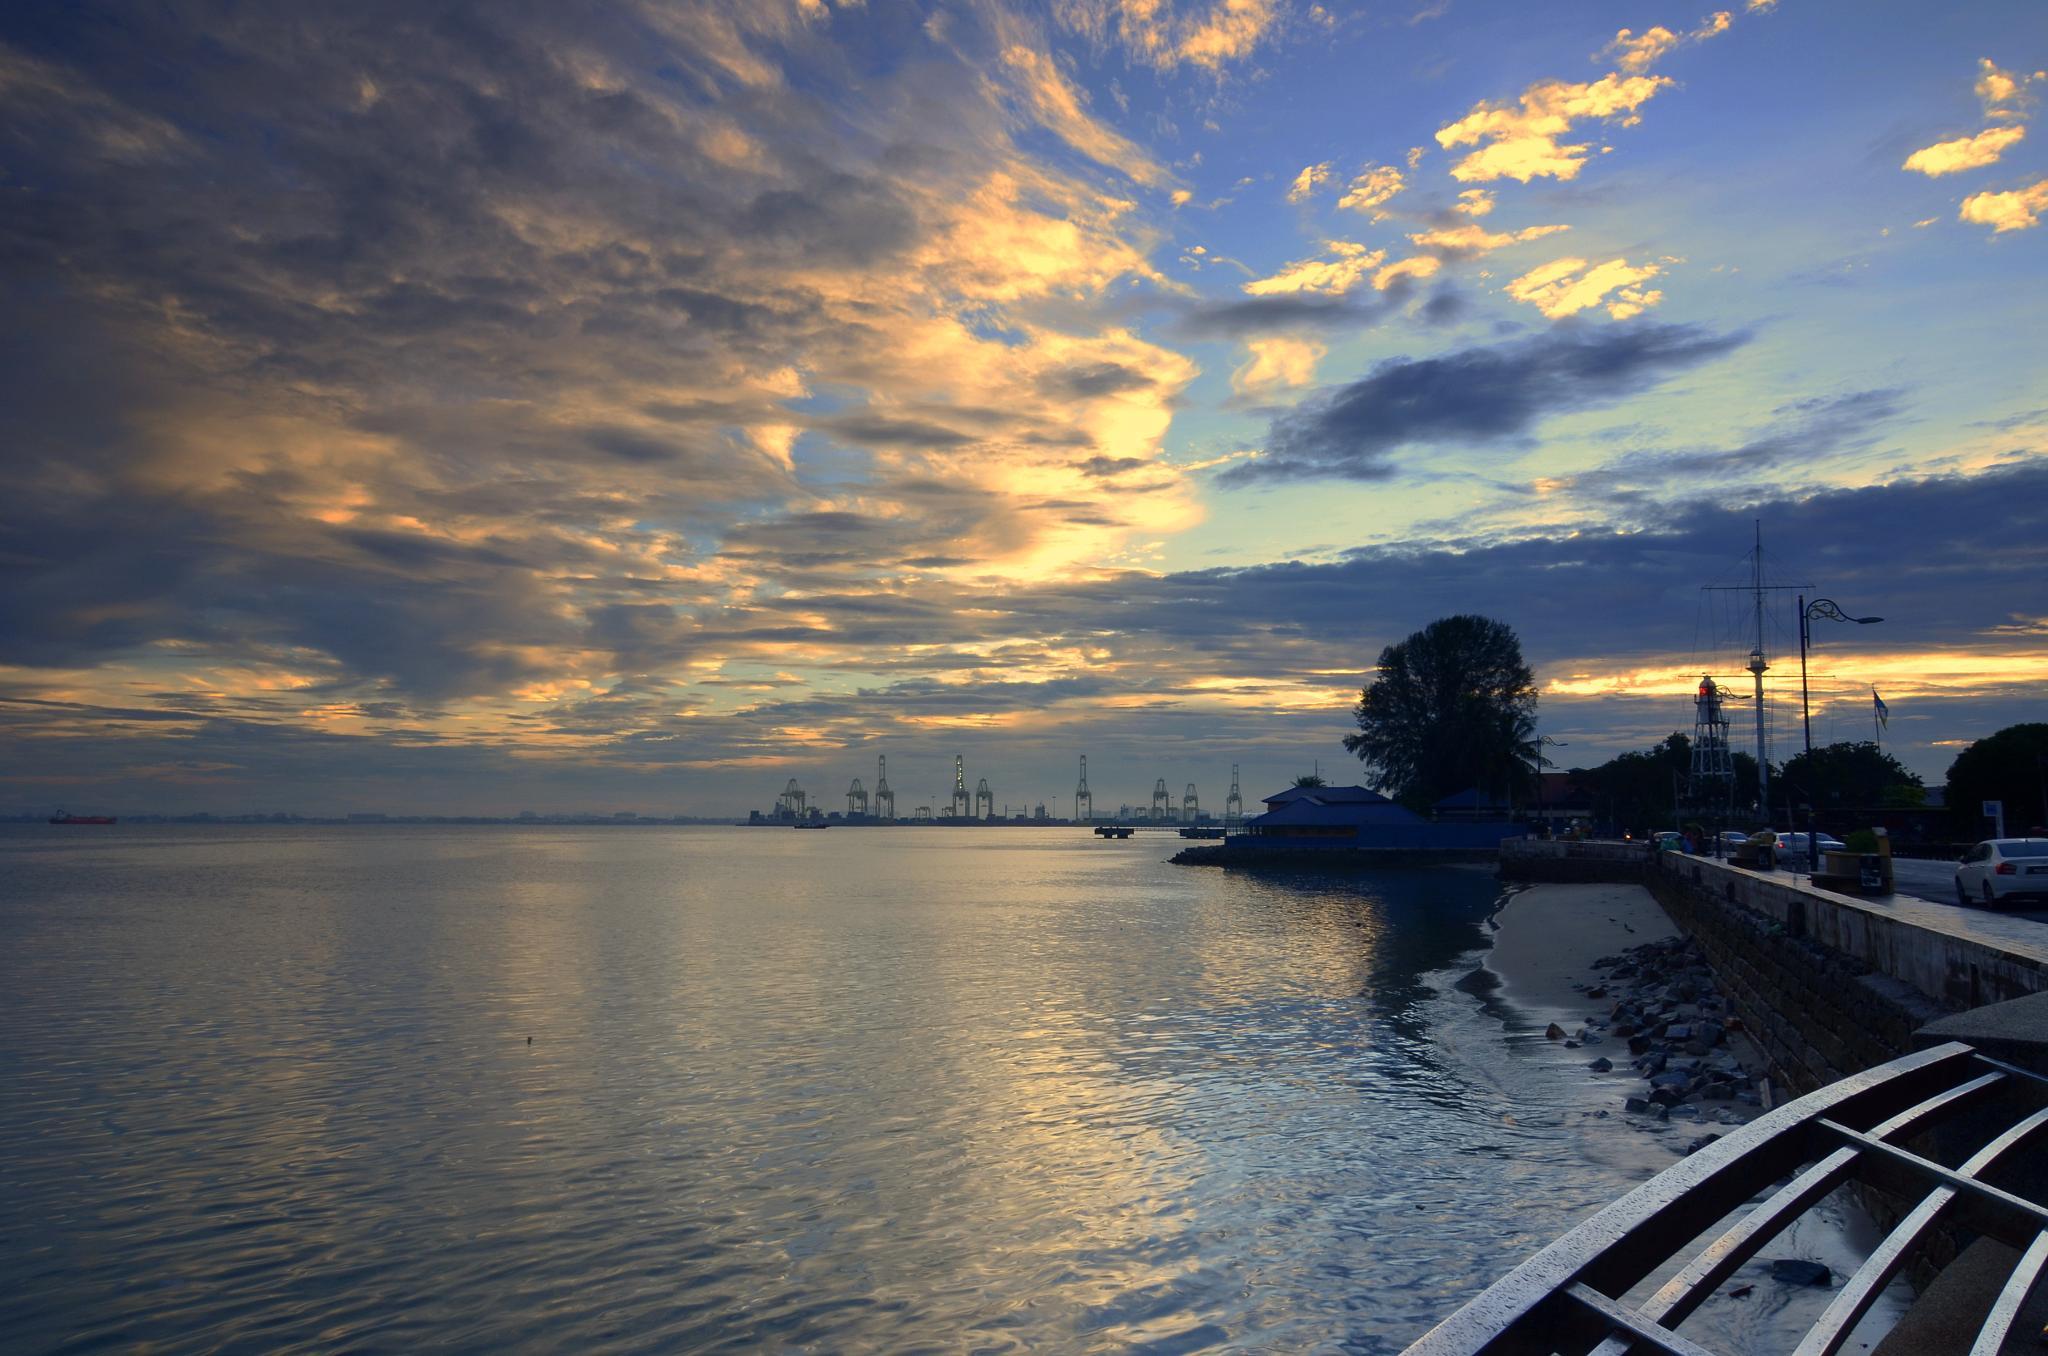 Sunrise at Esplanade. by davidngsh